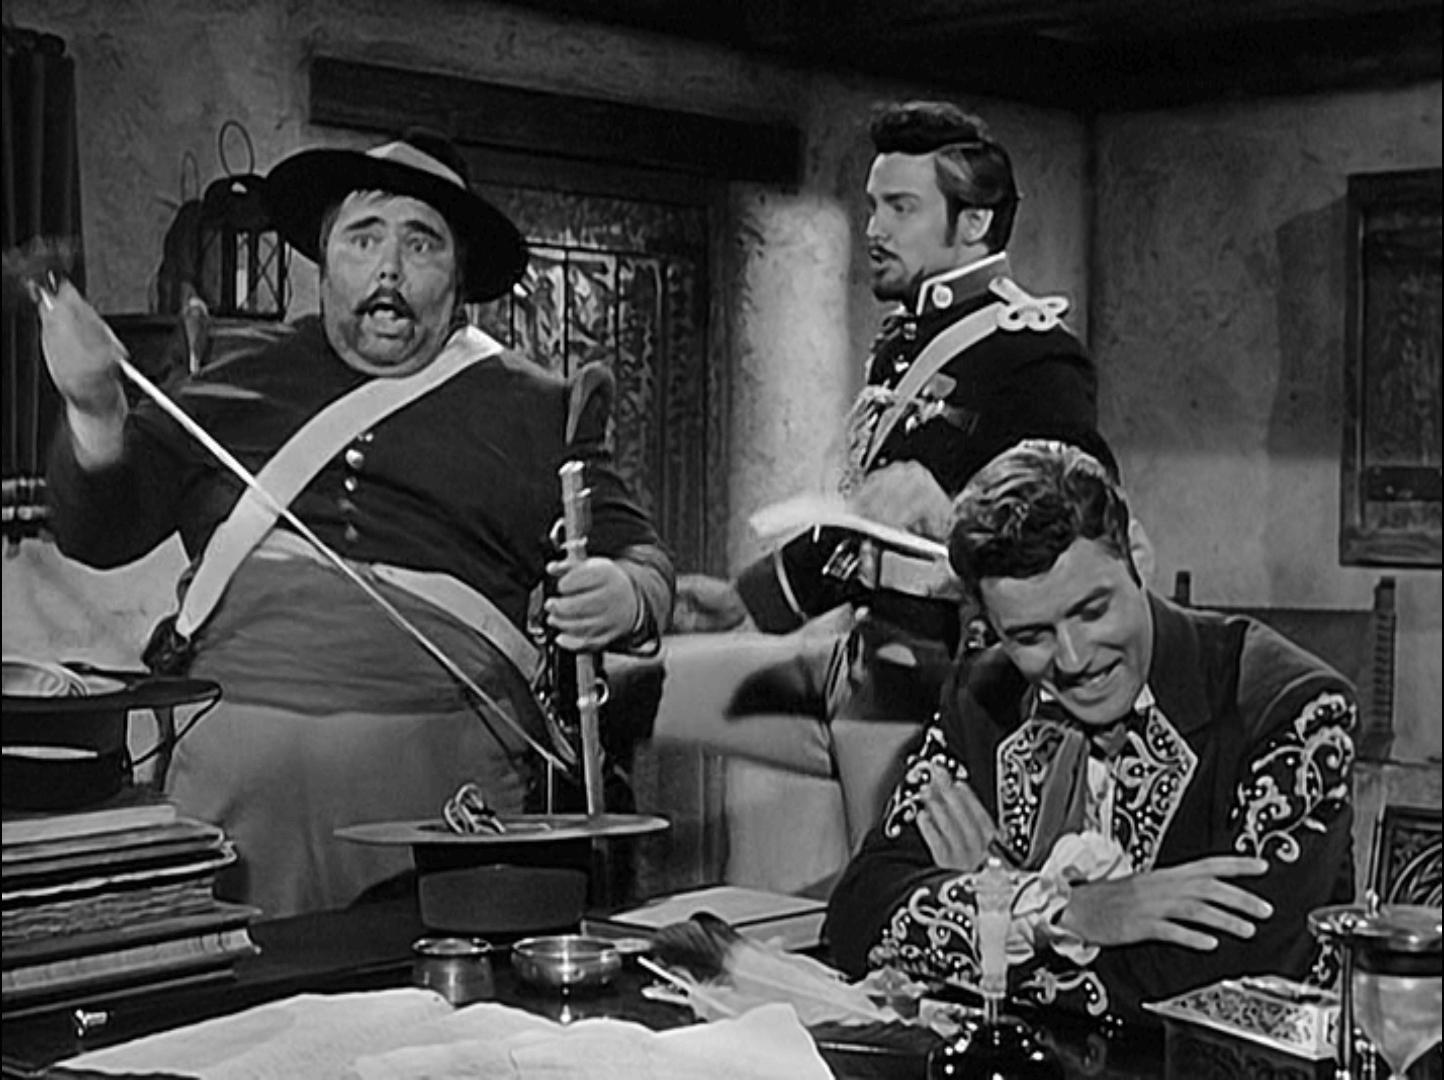 Monastario kopie Garcię, kadr z serialu Disney Zorro